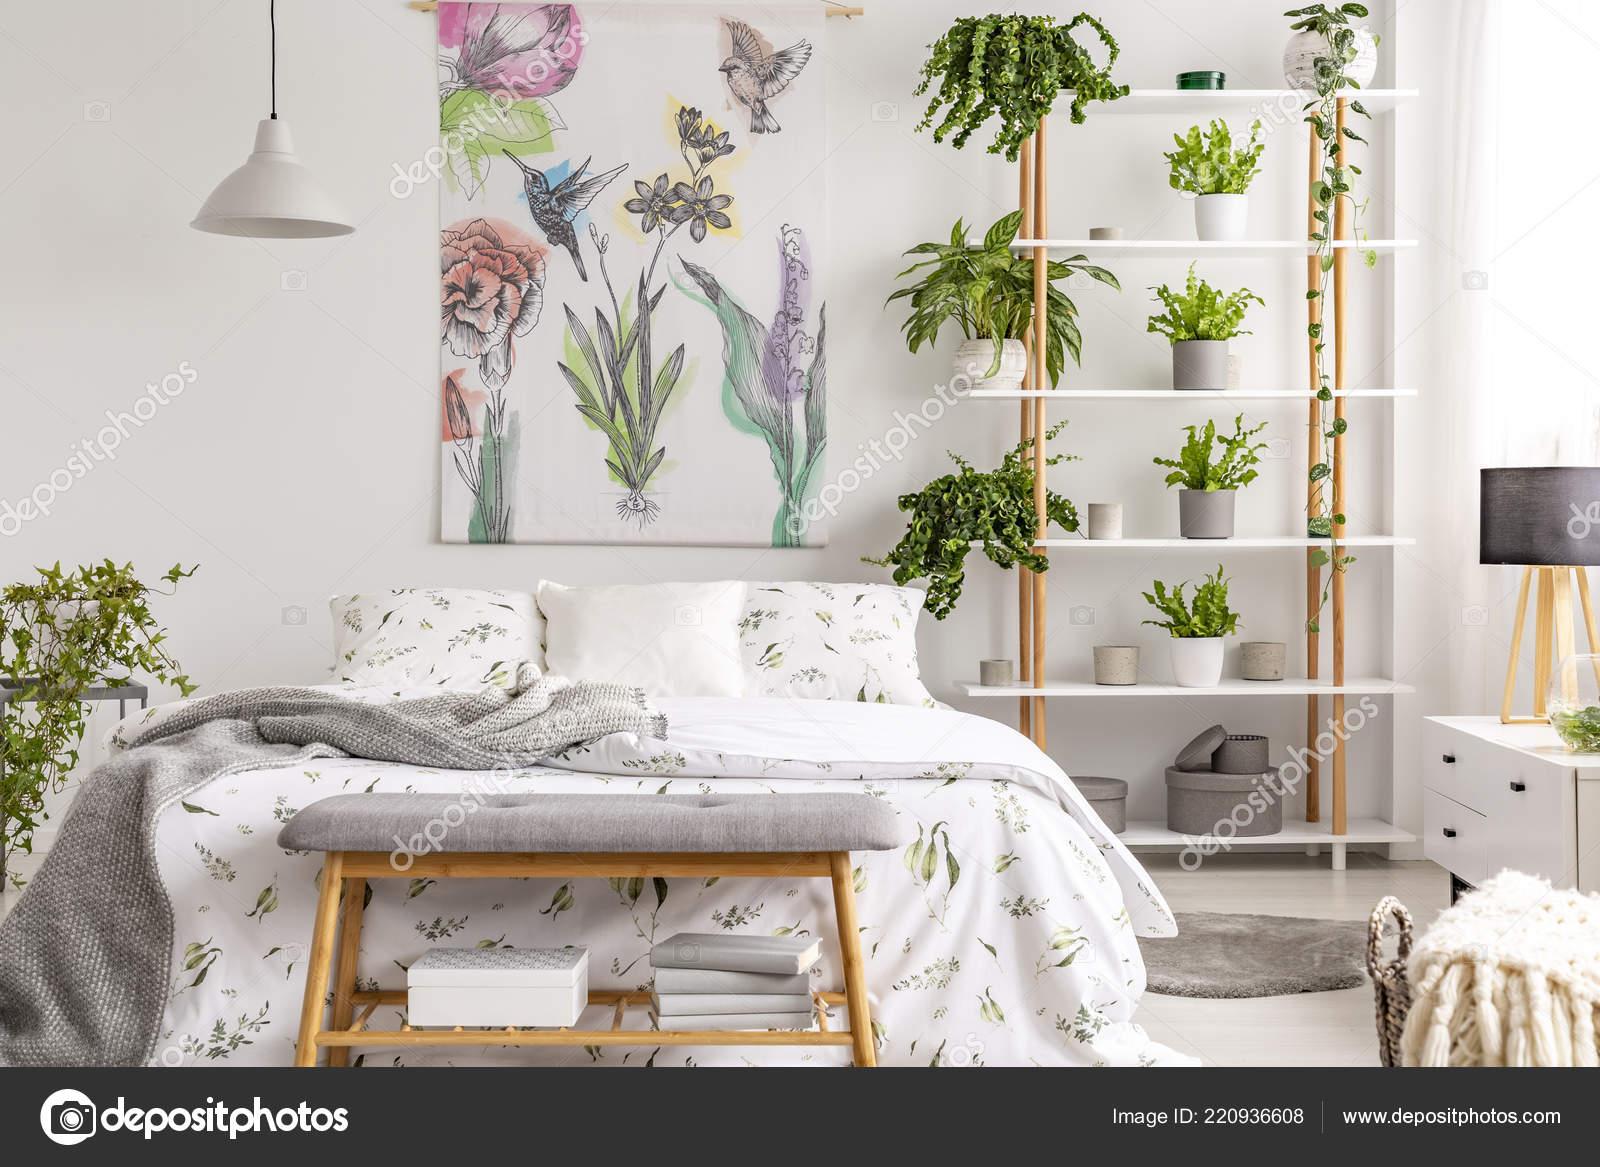 Real Photo White Bedroom Interior Many Fresh Plants King Size